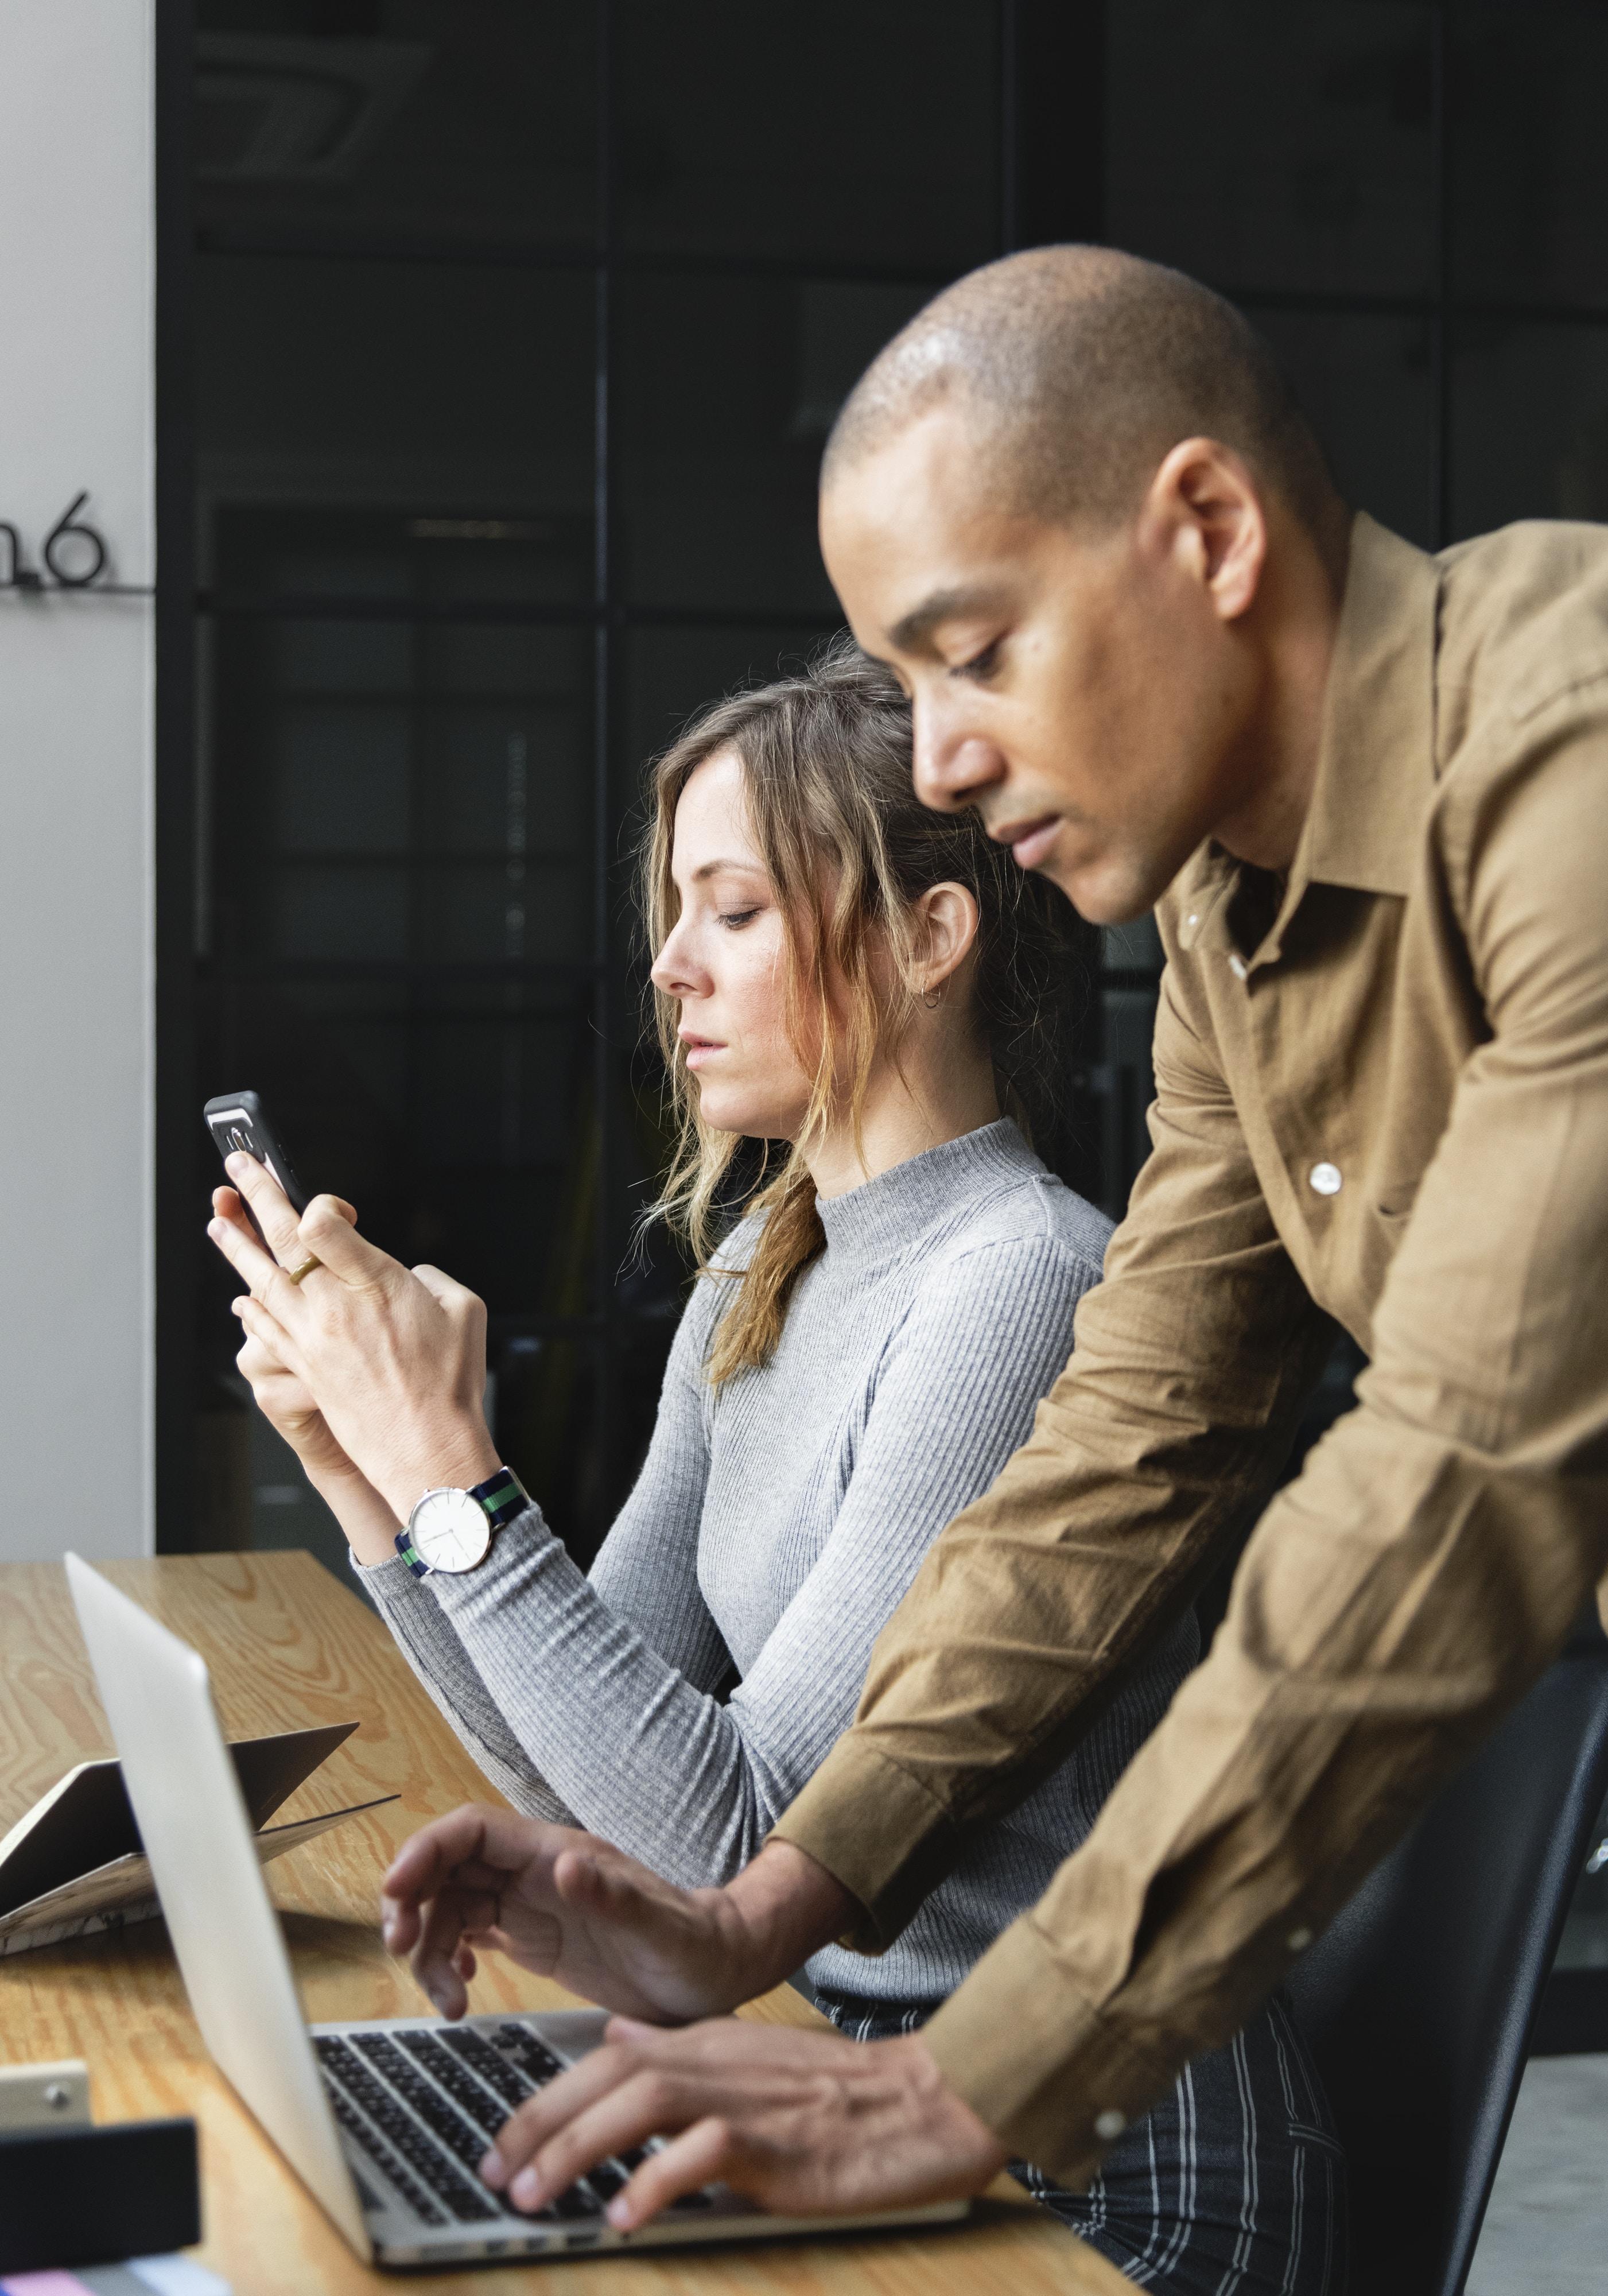 man using laptop besides woman sitting while using smartphone